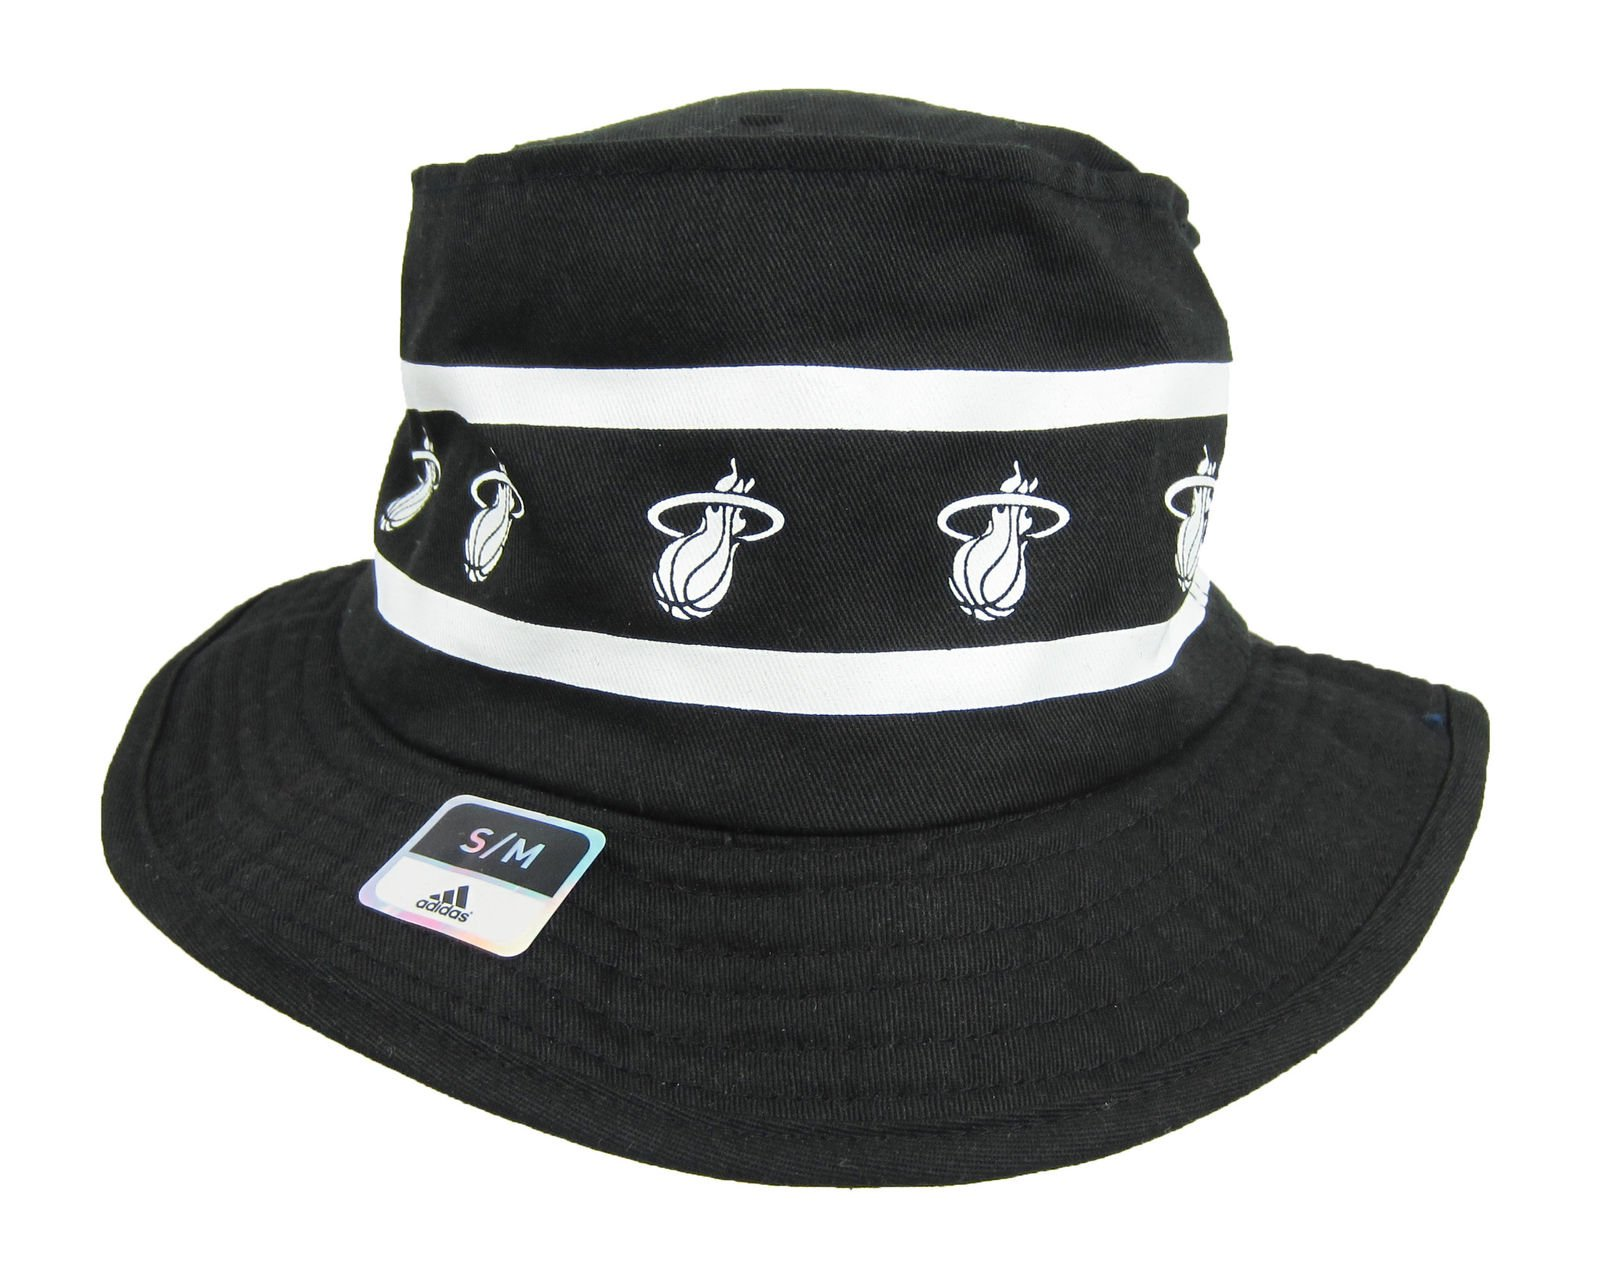 86dab27c47f Adidas NBA Miami Heat Size Small Bucket Hat Black And White ...